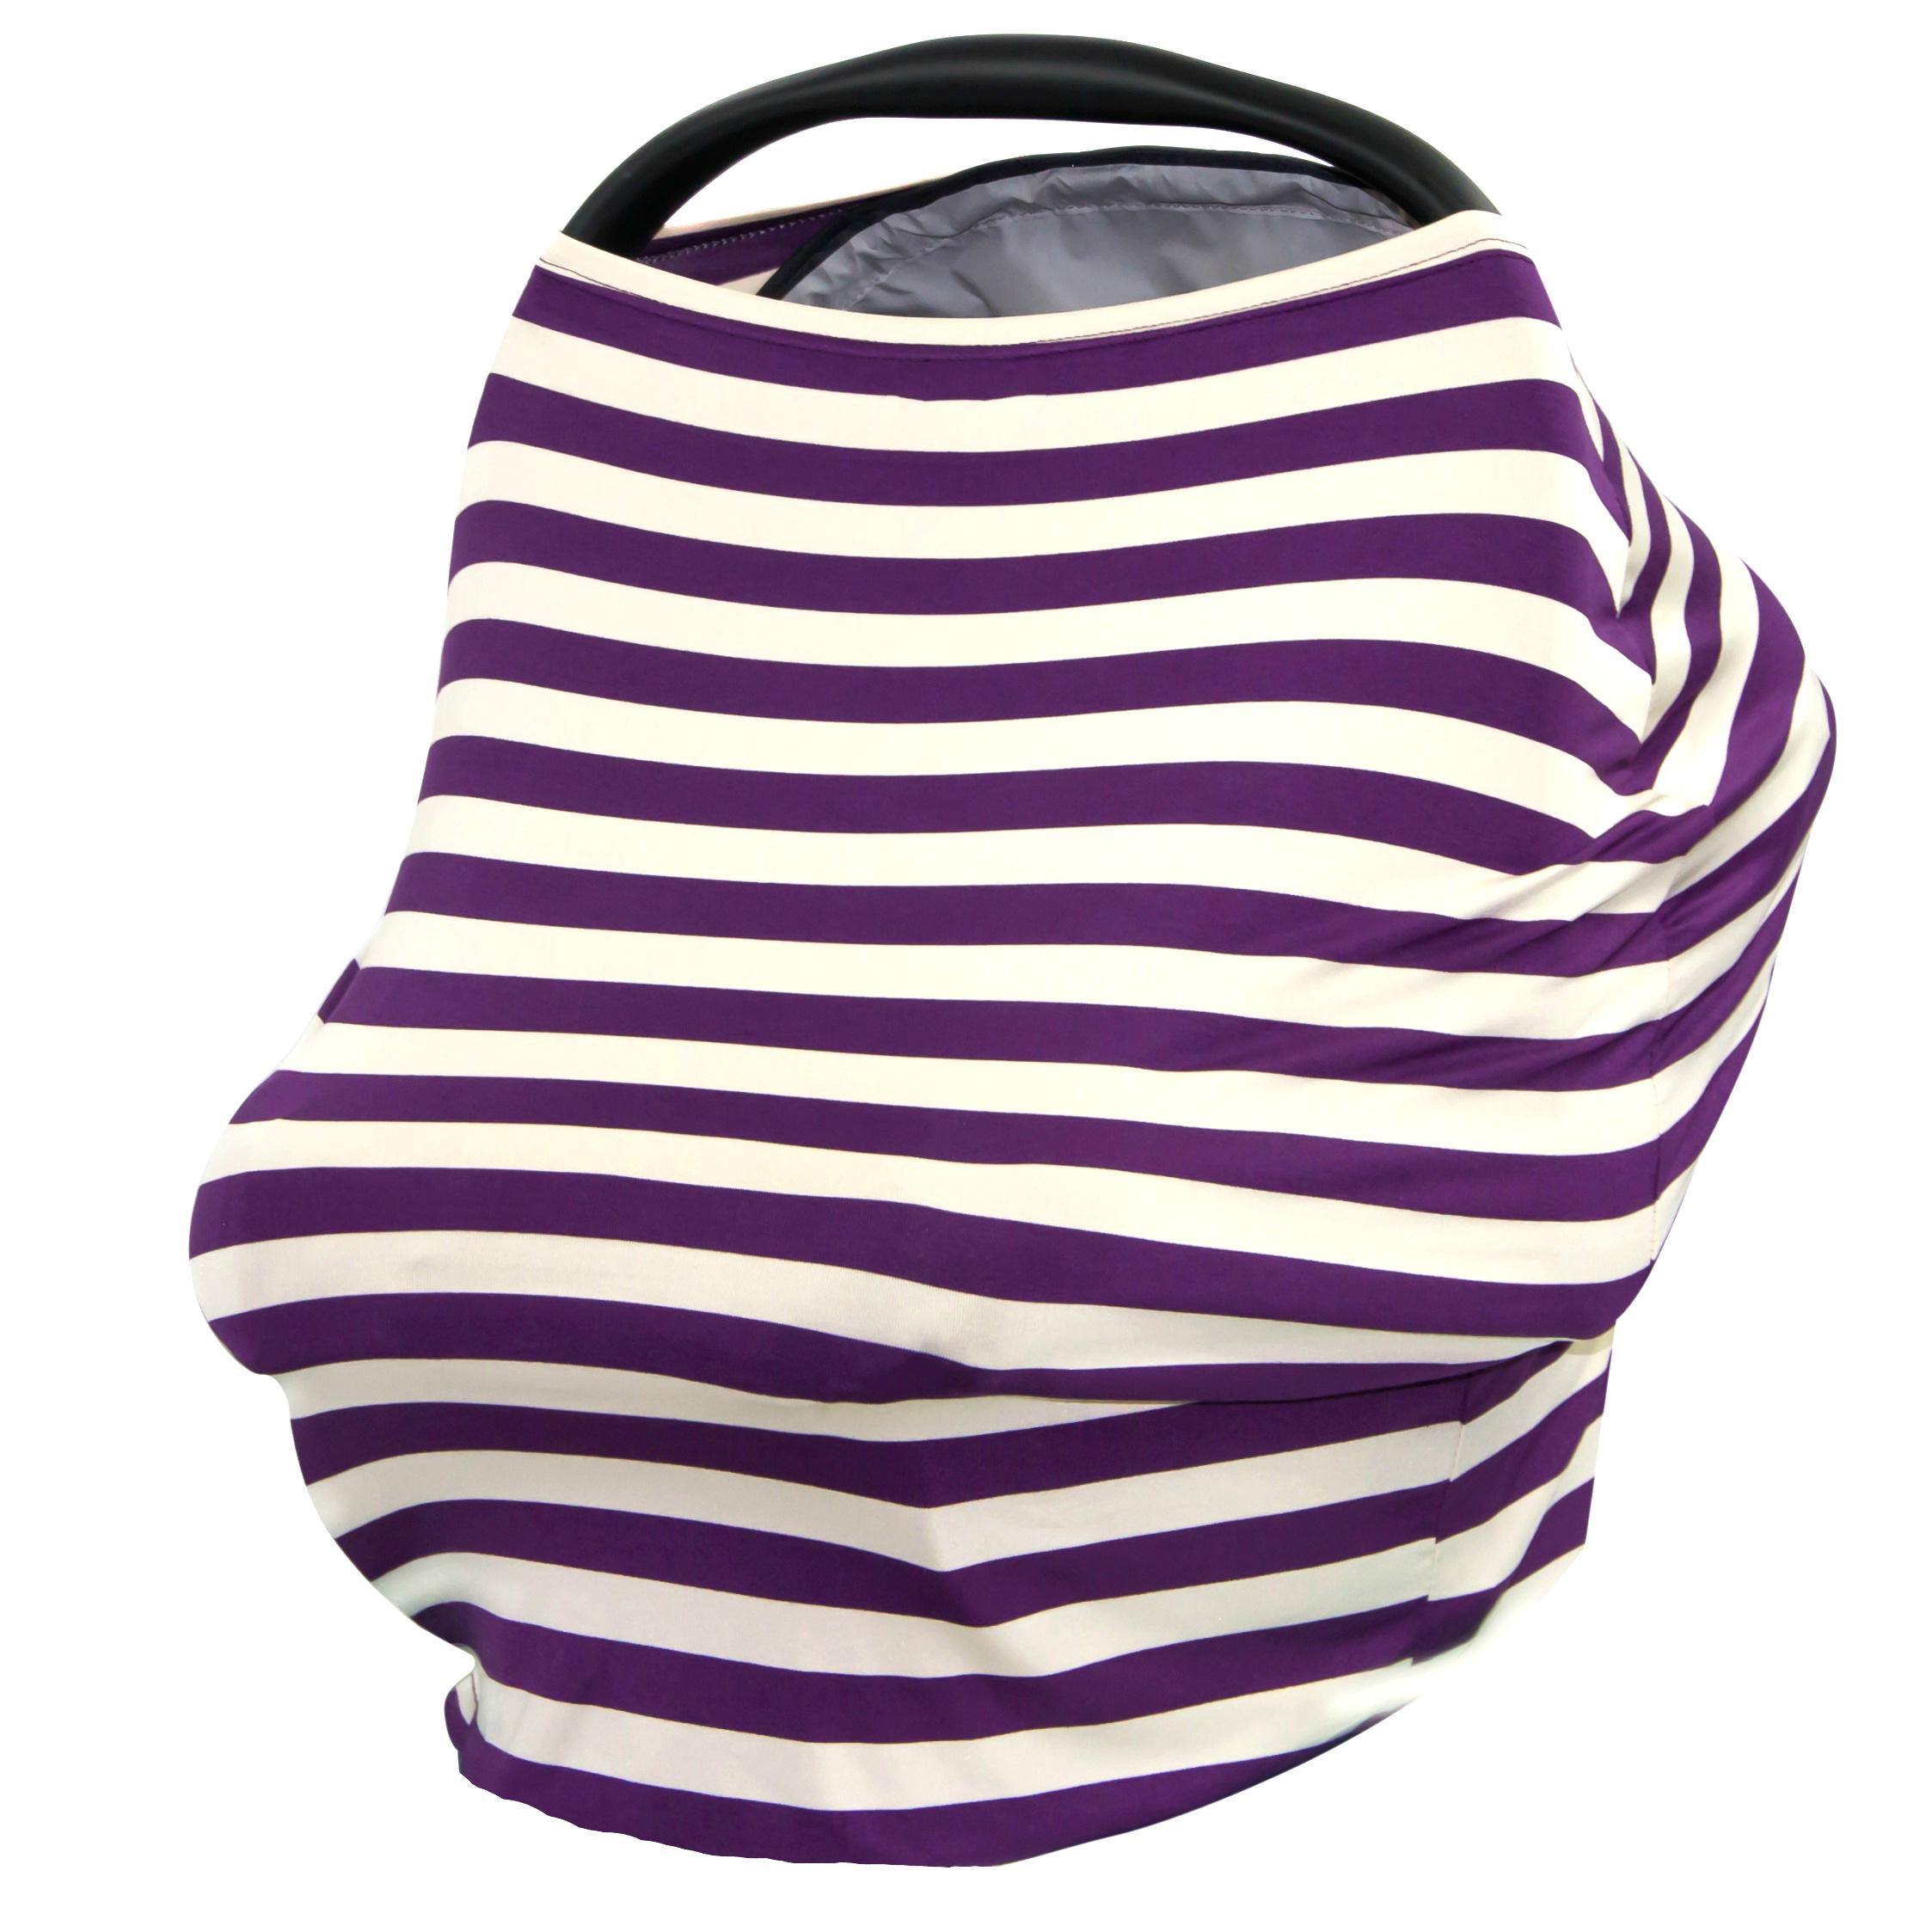 JLIKA Baby Car Seat Canopy Cover and Stretchy Nursing Cover - Grape Crème Stripe